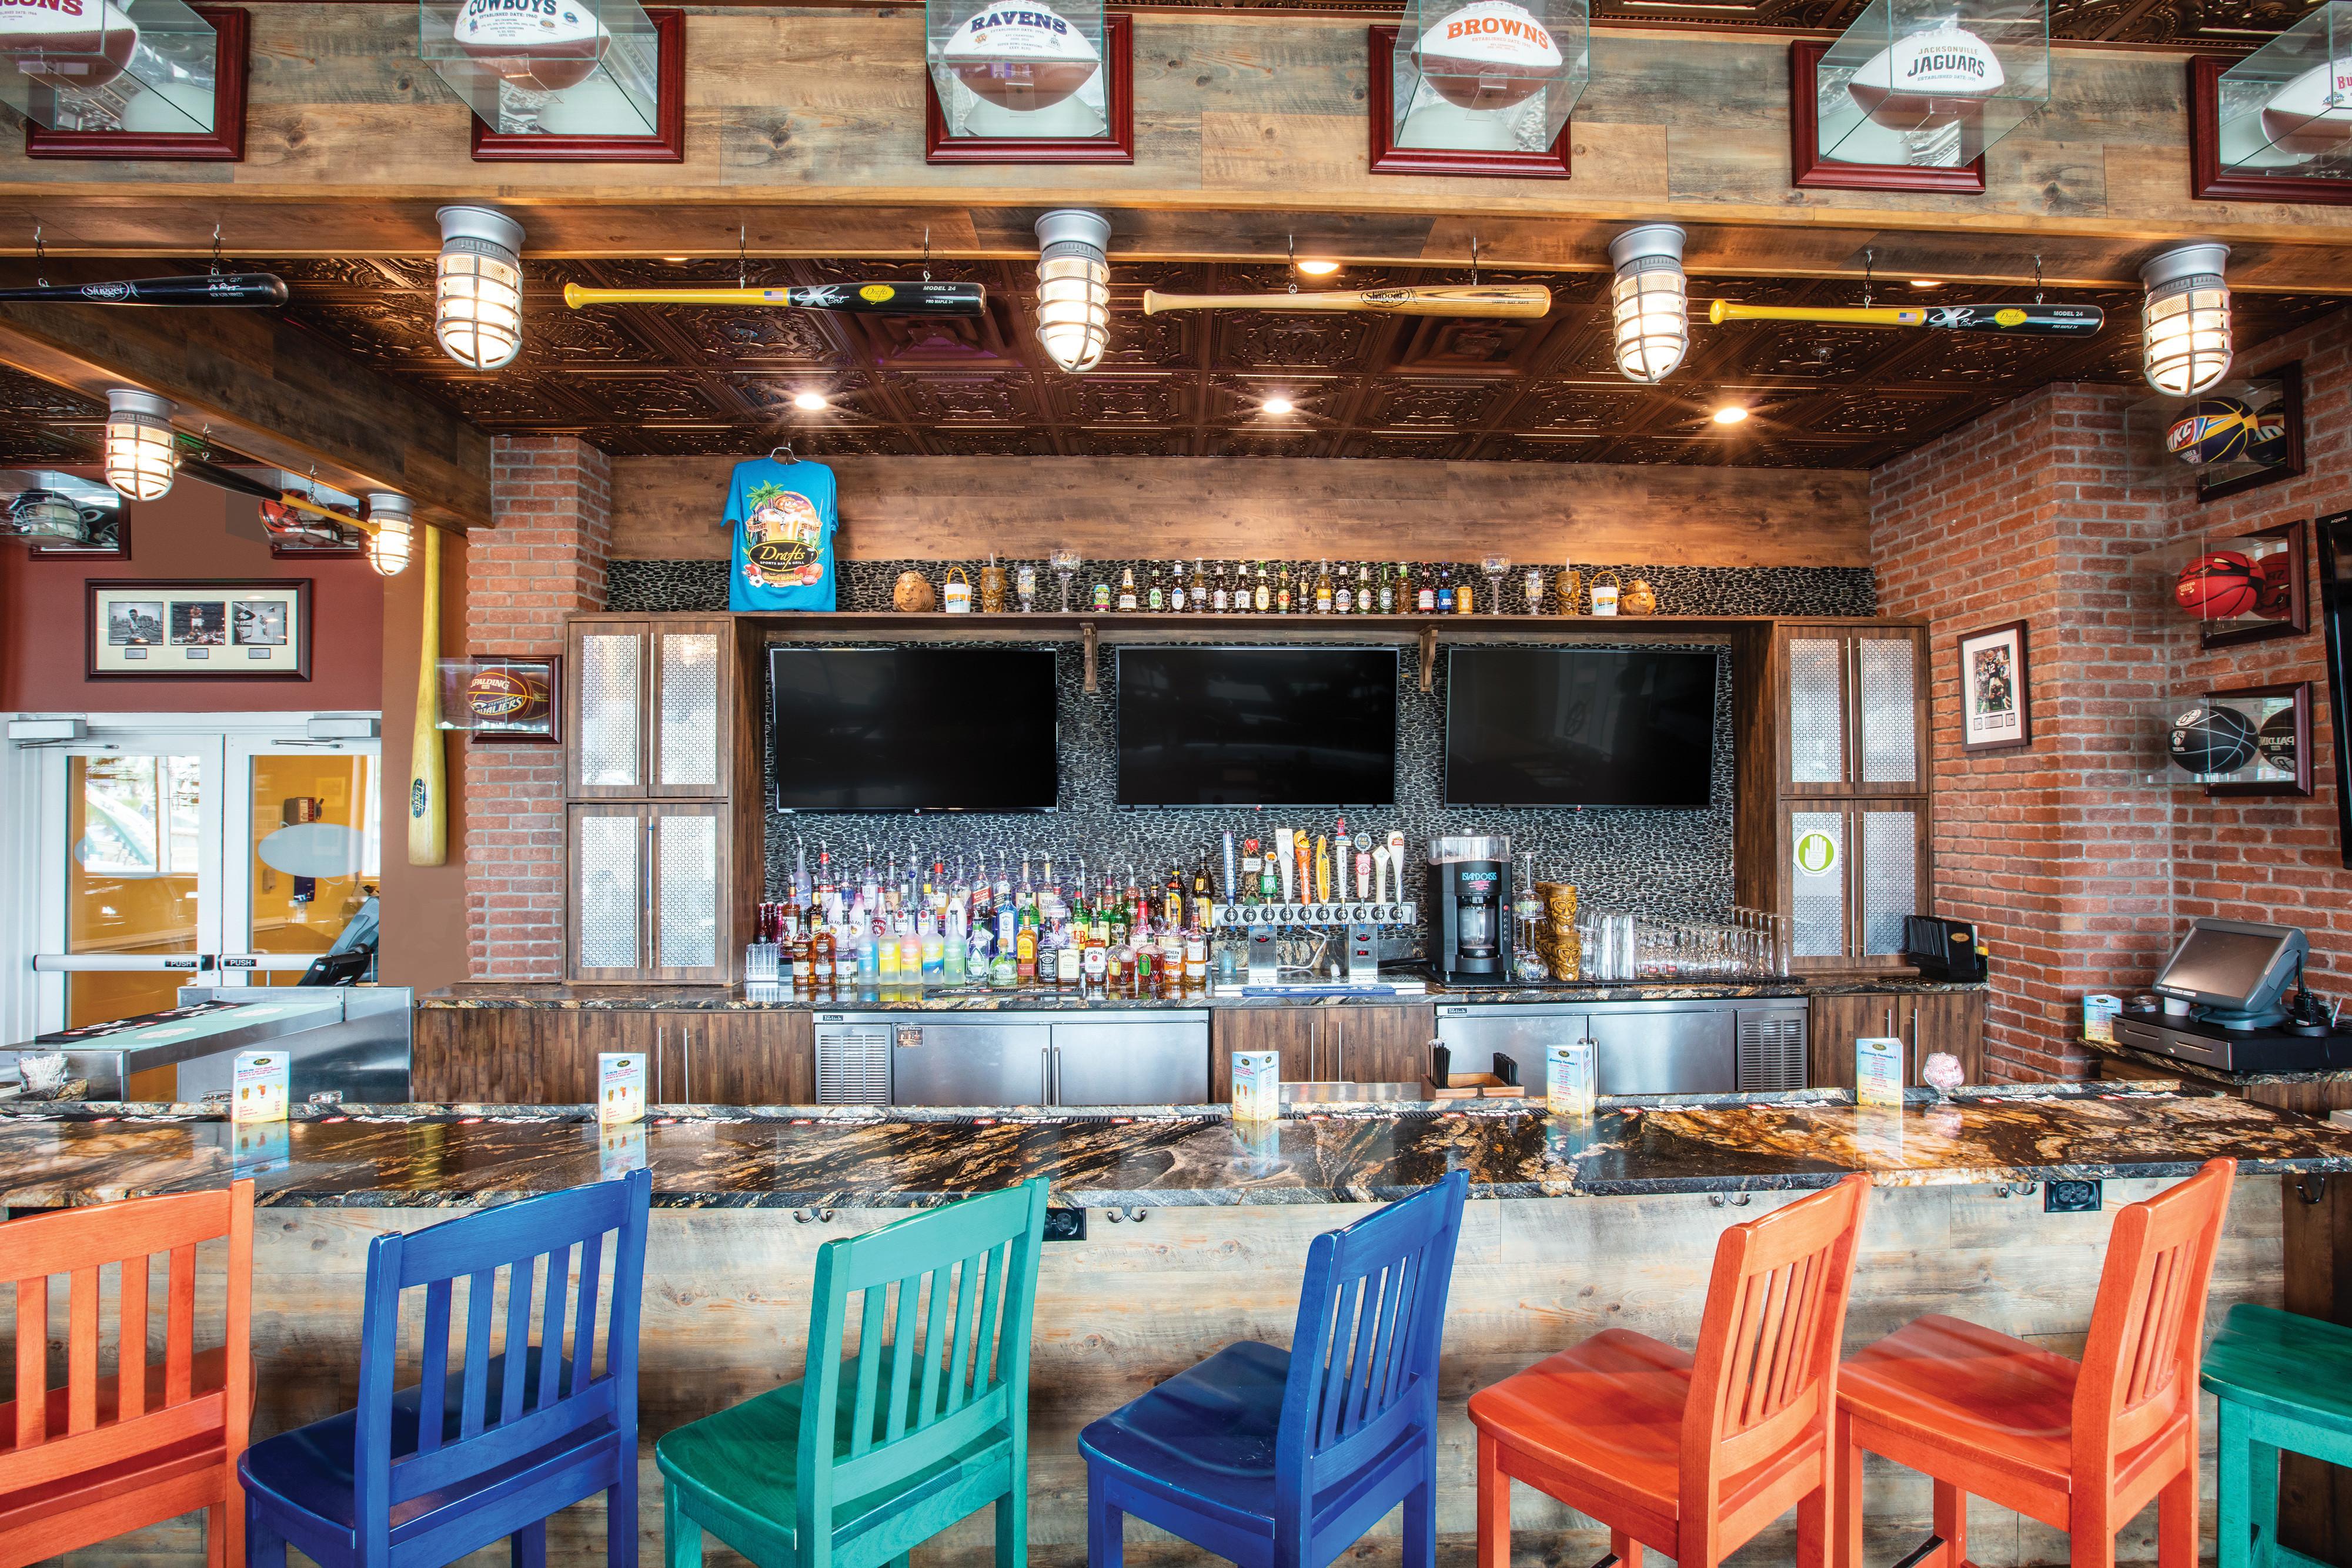 The Best Myrtle Beach Boardwalk Restaurants | Drafts Burger Bar